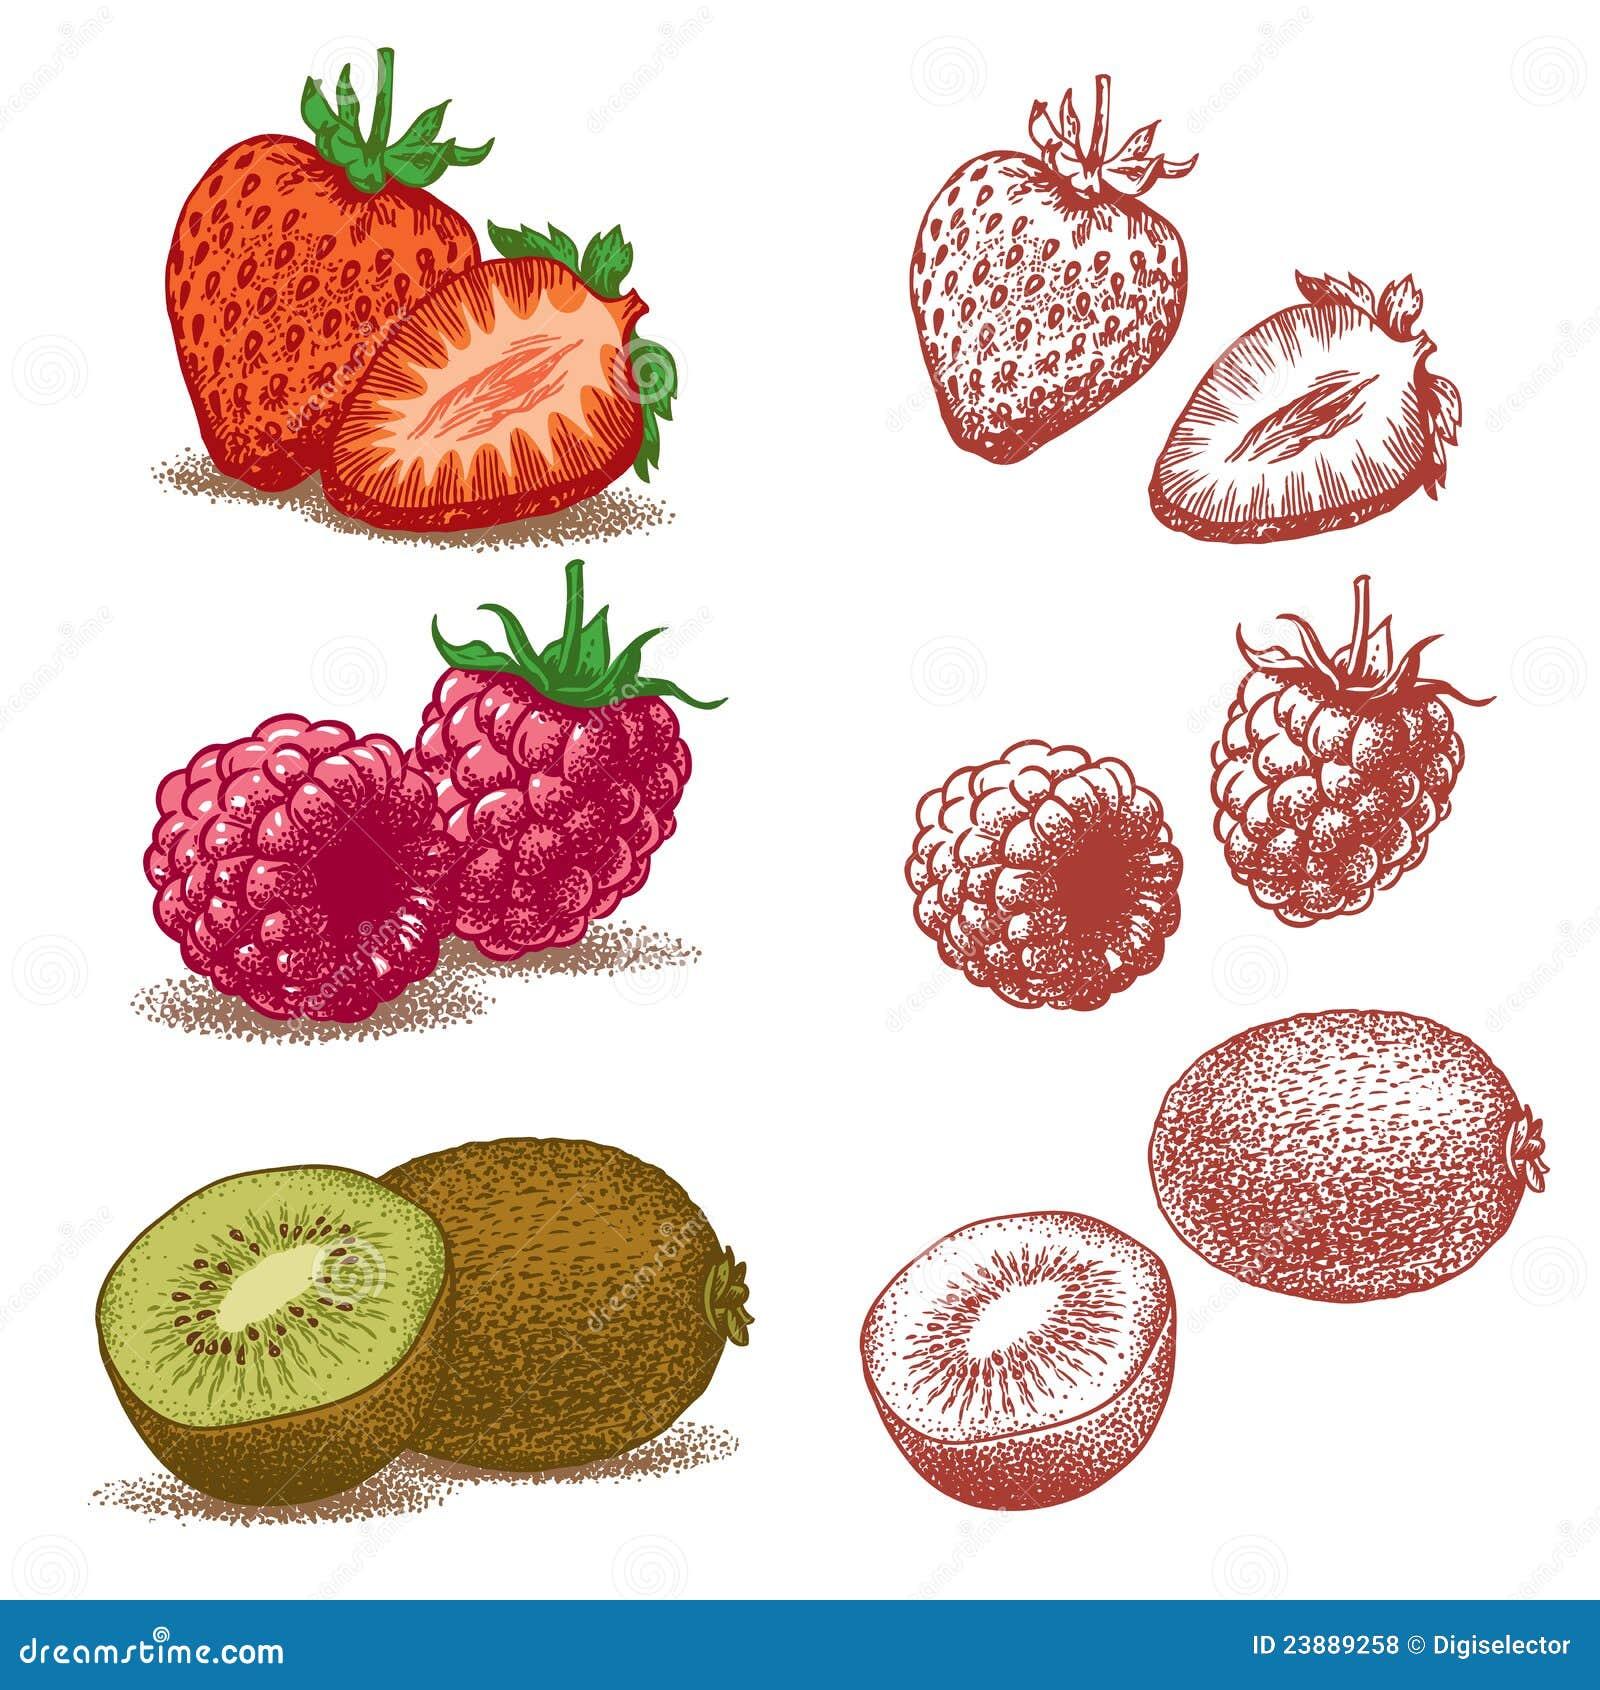 Erdbeere, Himbeere und Kiwi